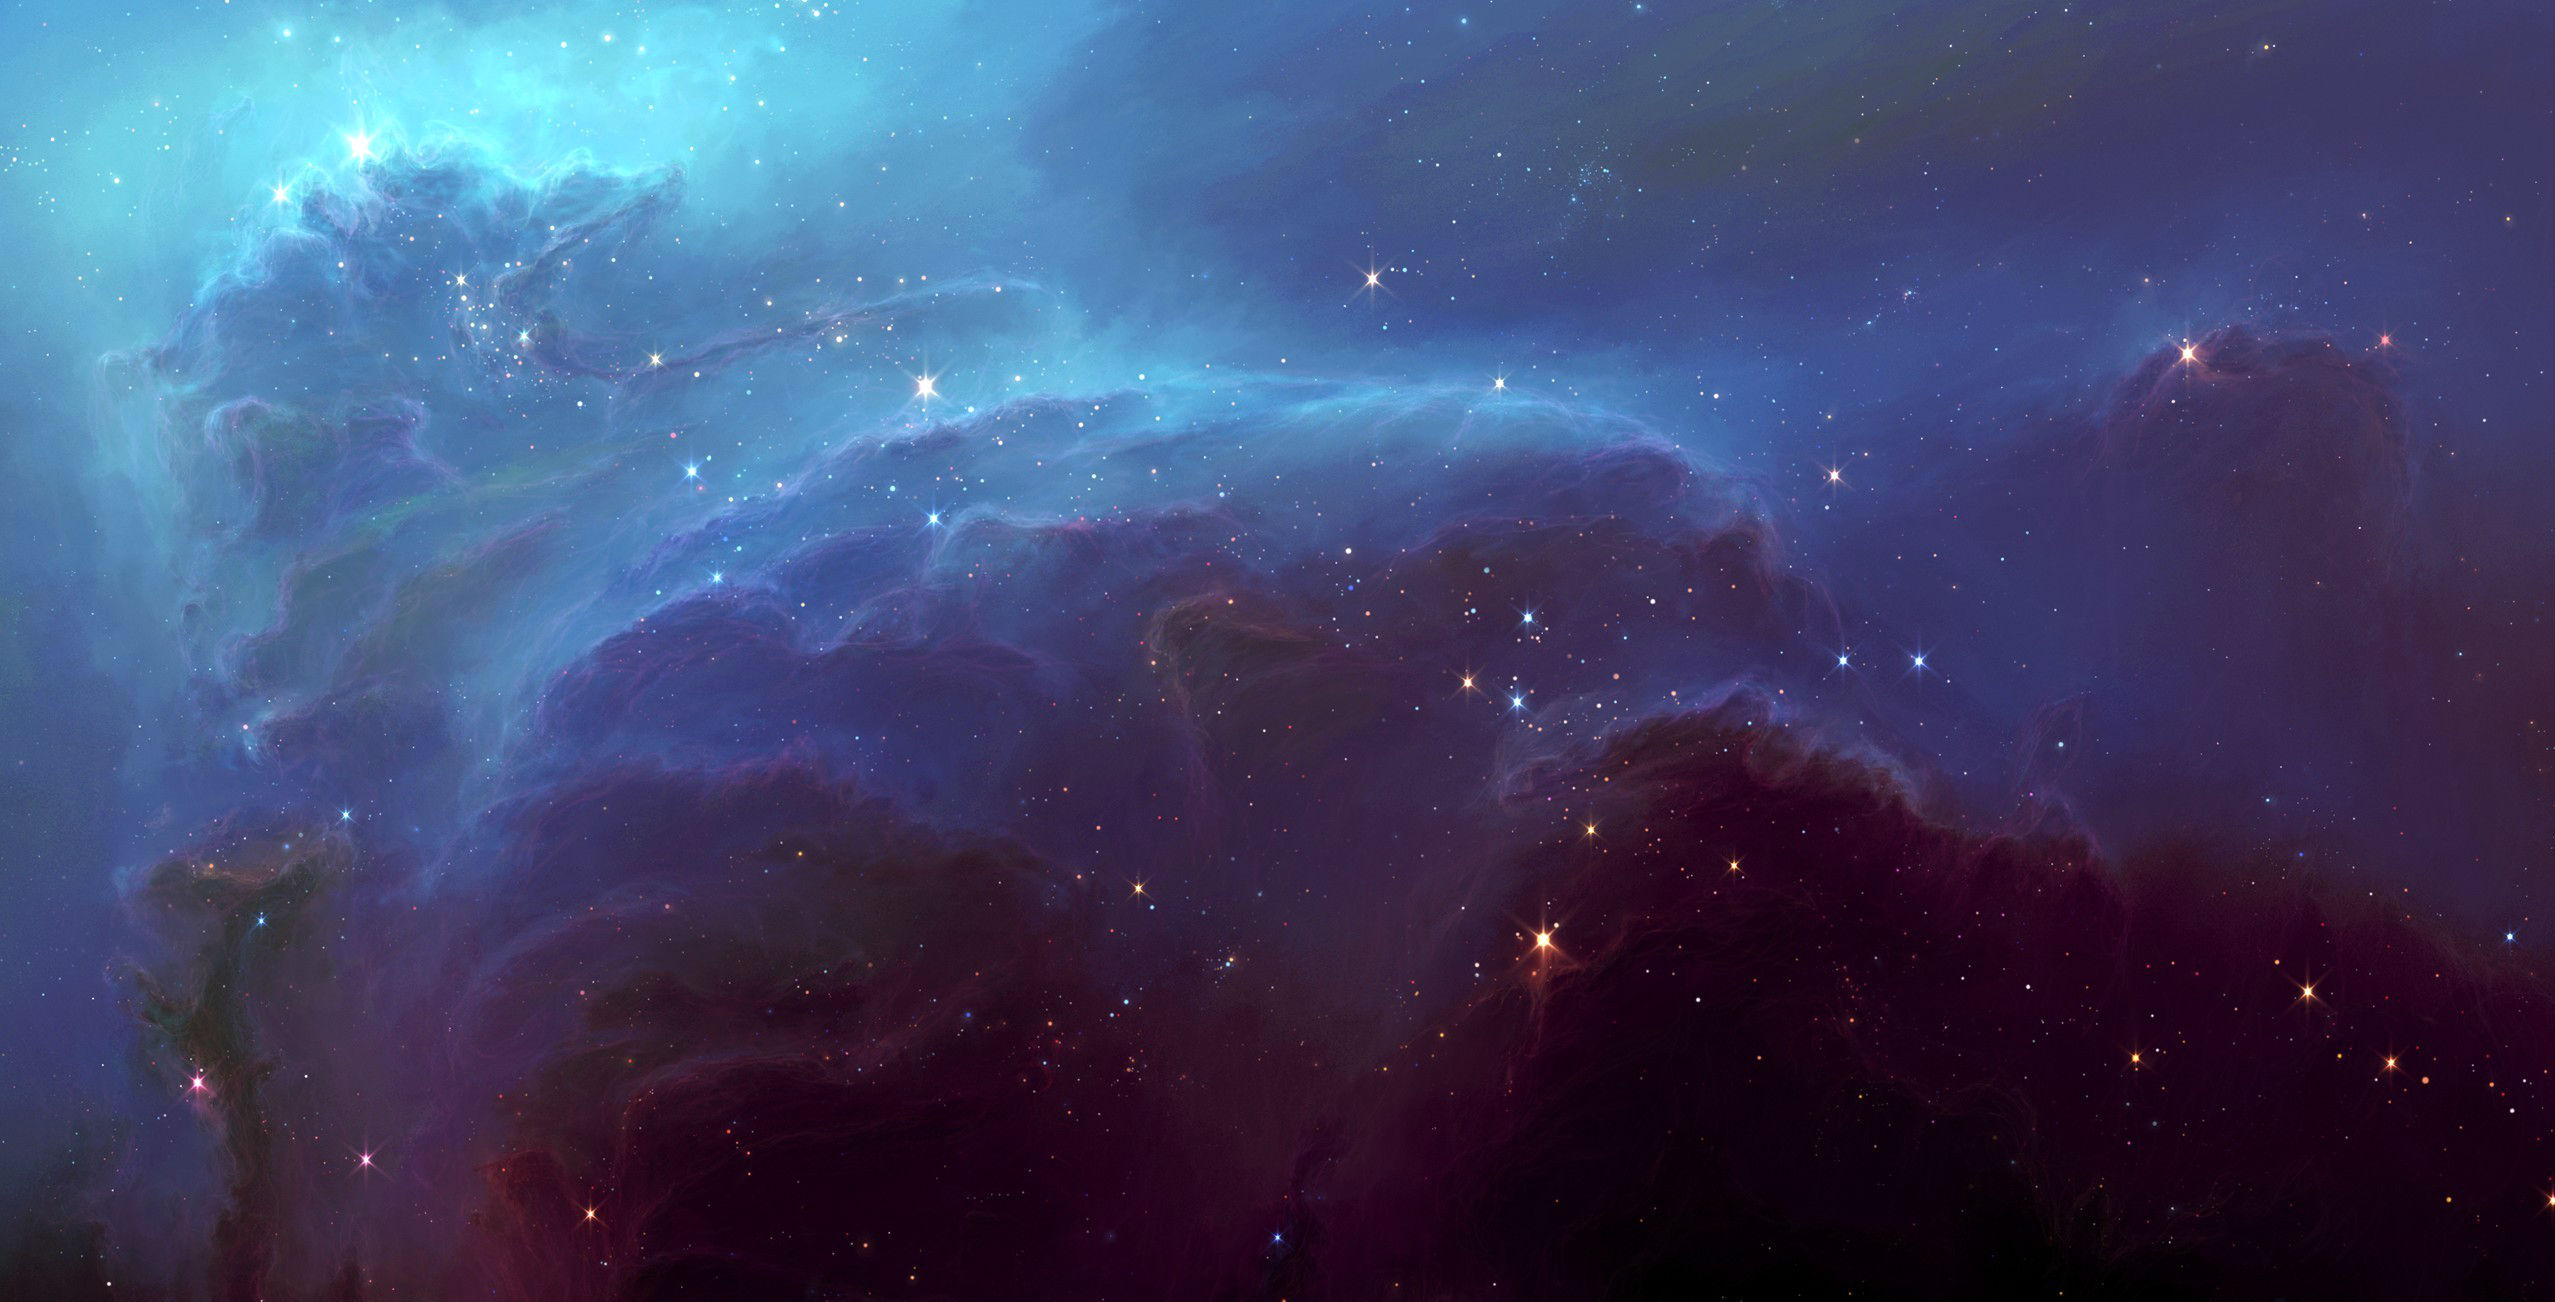 Desktop Nebula HD Wallpapers 2555x1302